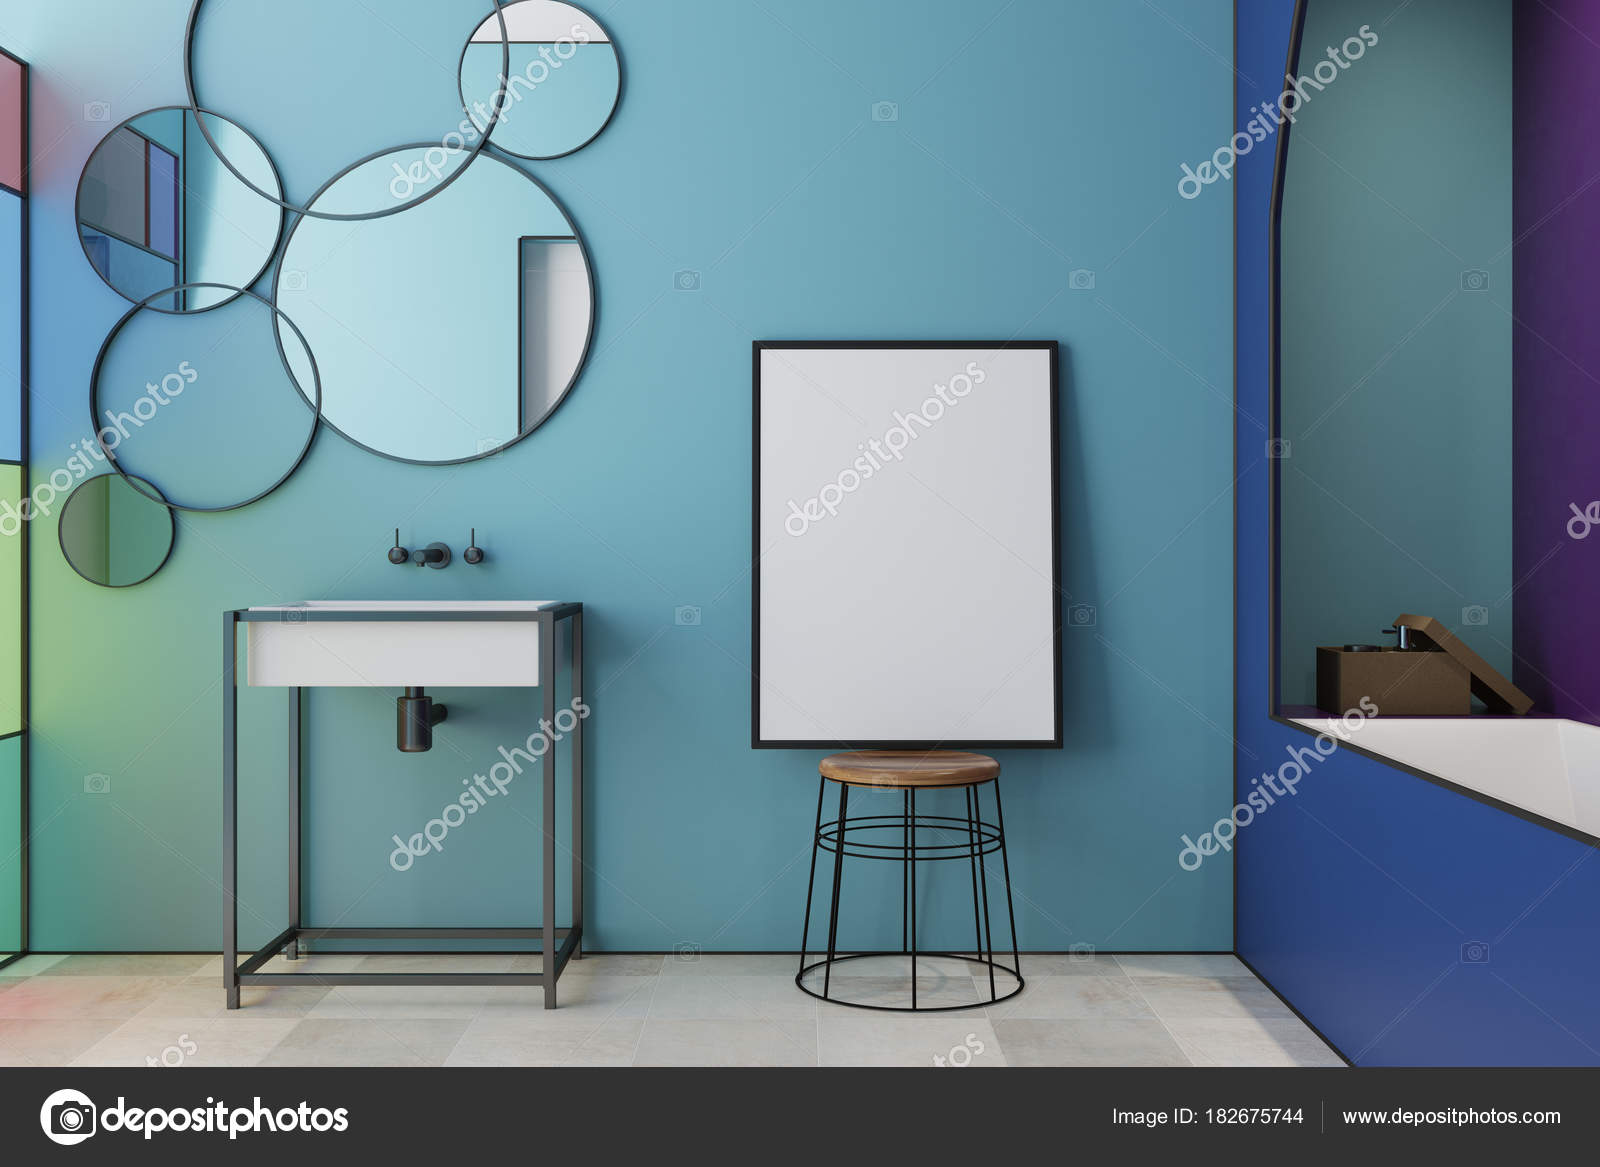 Bagni Colorati Blu : Blu macchiato vetro bagno vasca lavandino poster u foto stock